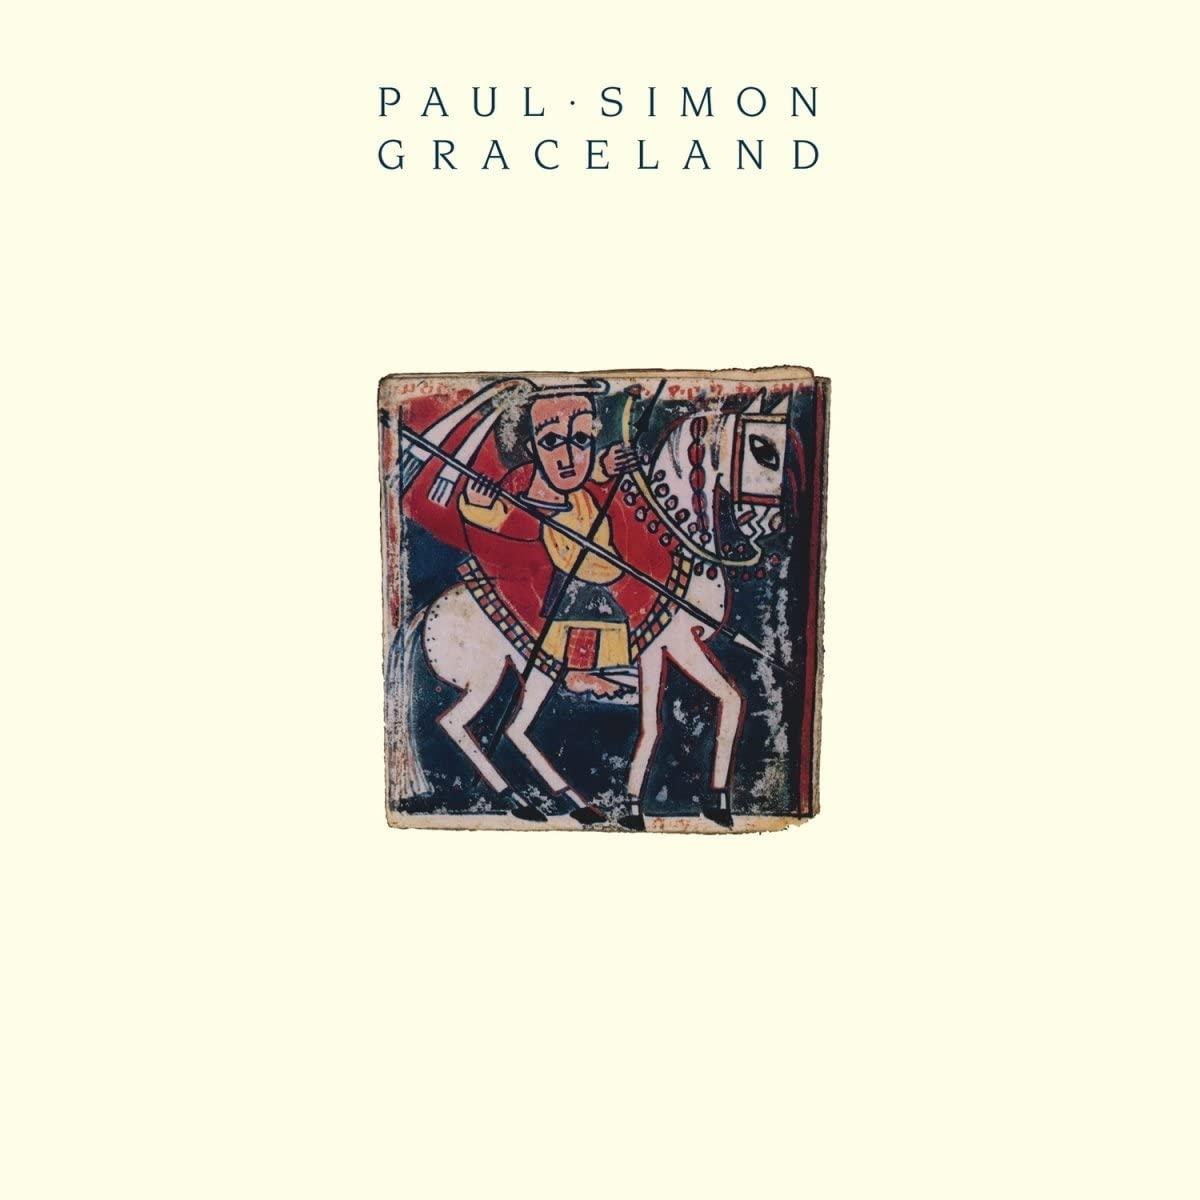 Paul Simon - Graceland (Vinyl) - £13.99 @ Amazon (+£2.99 non-prime)